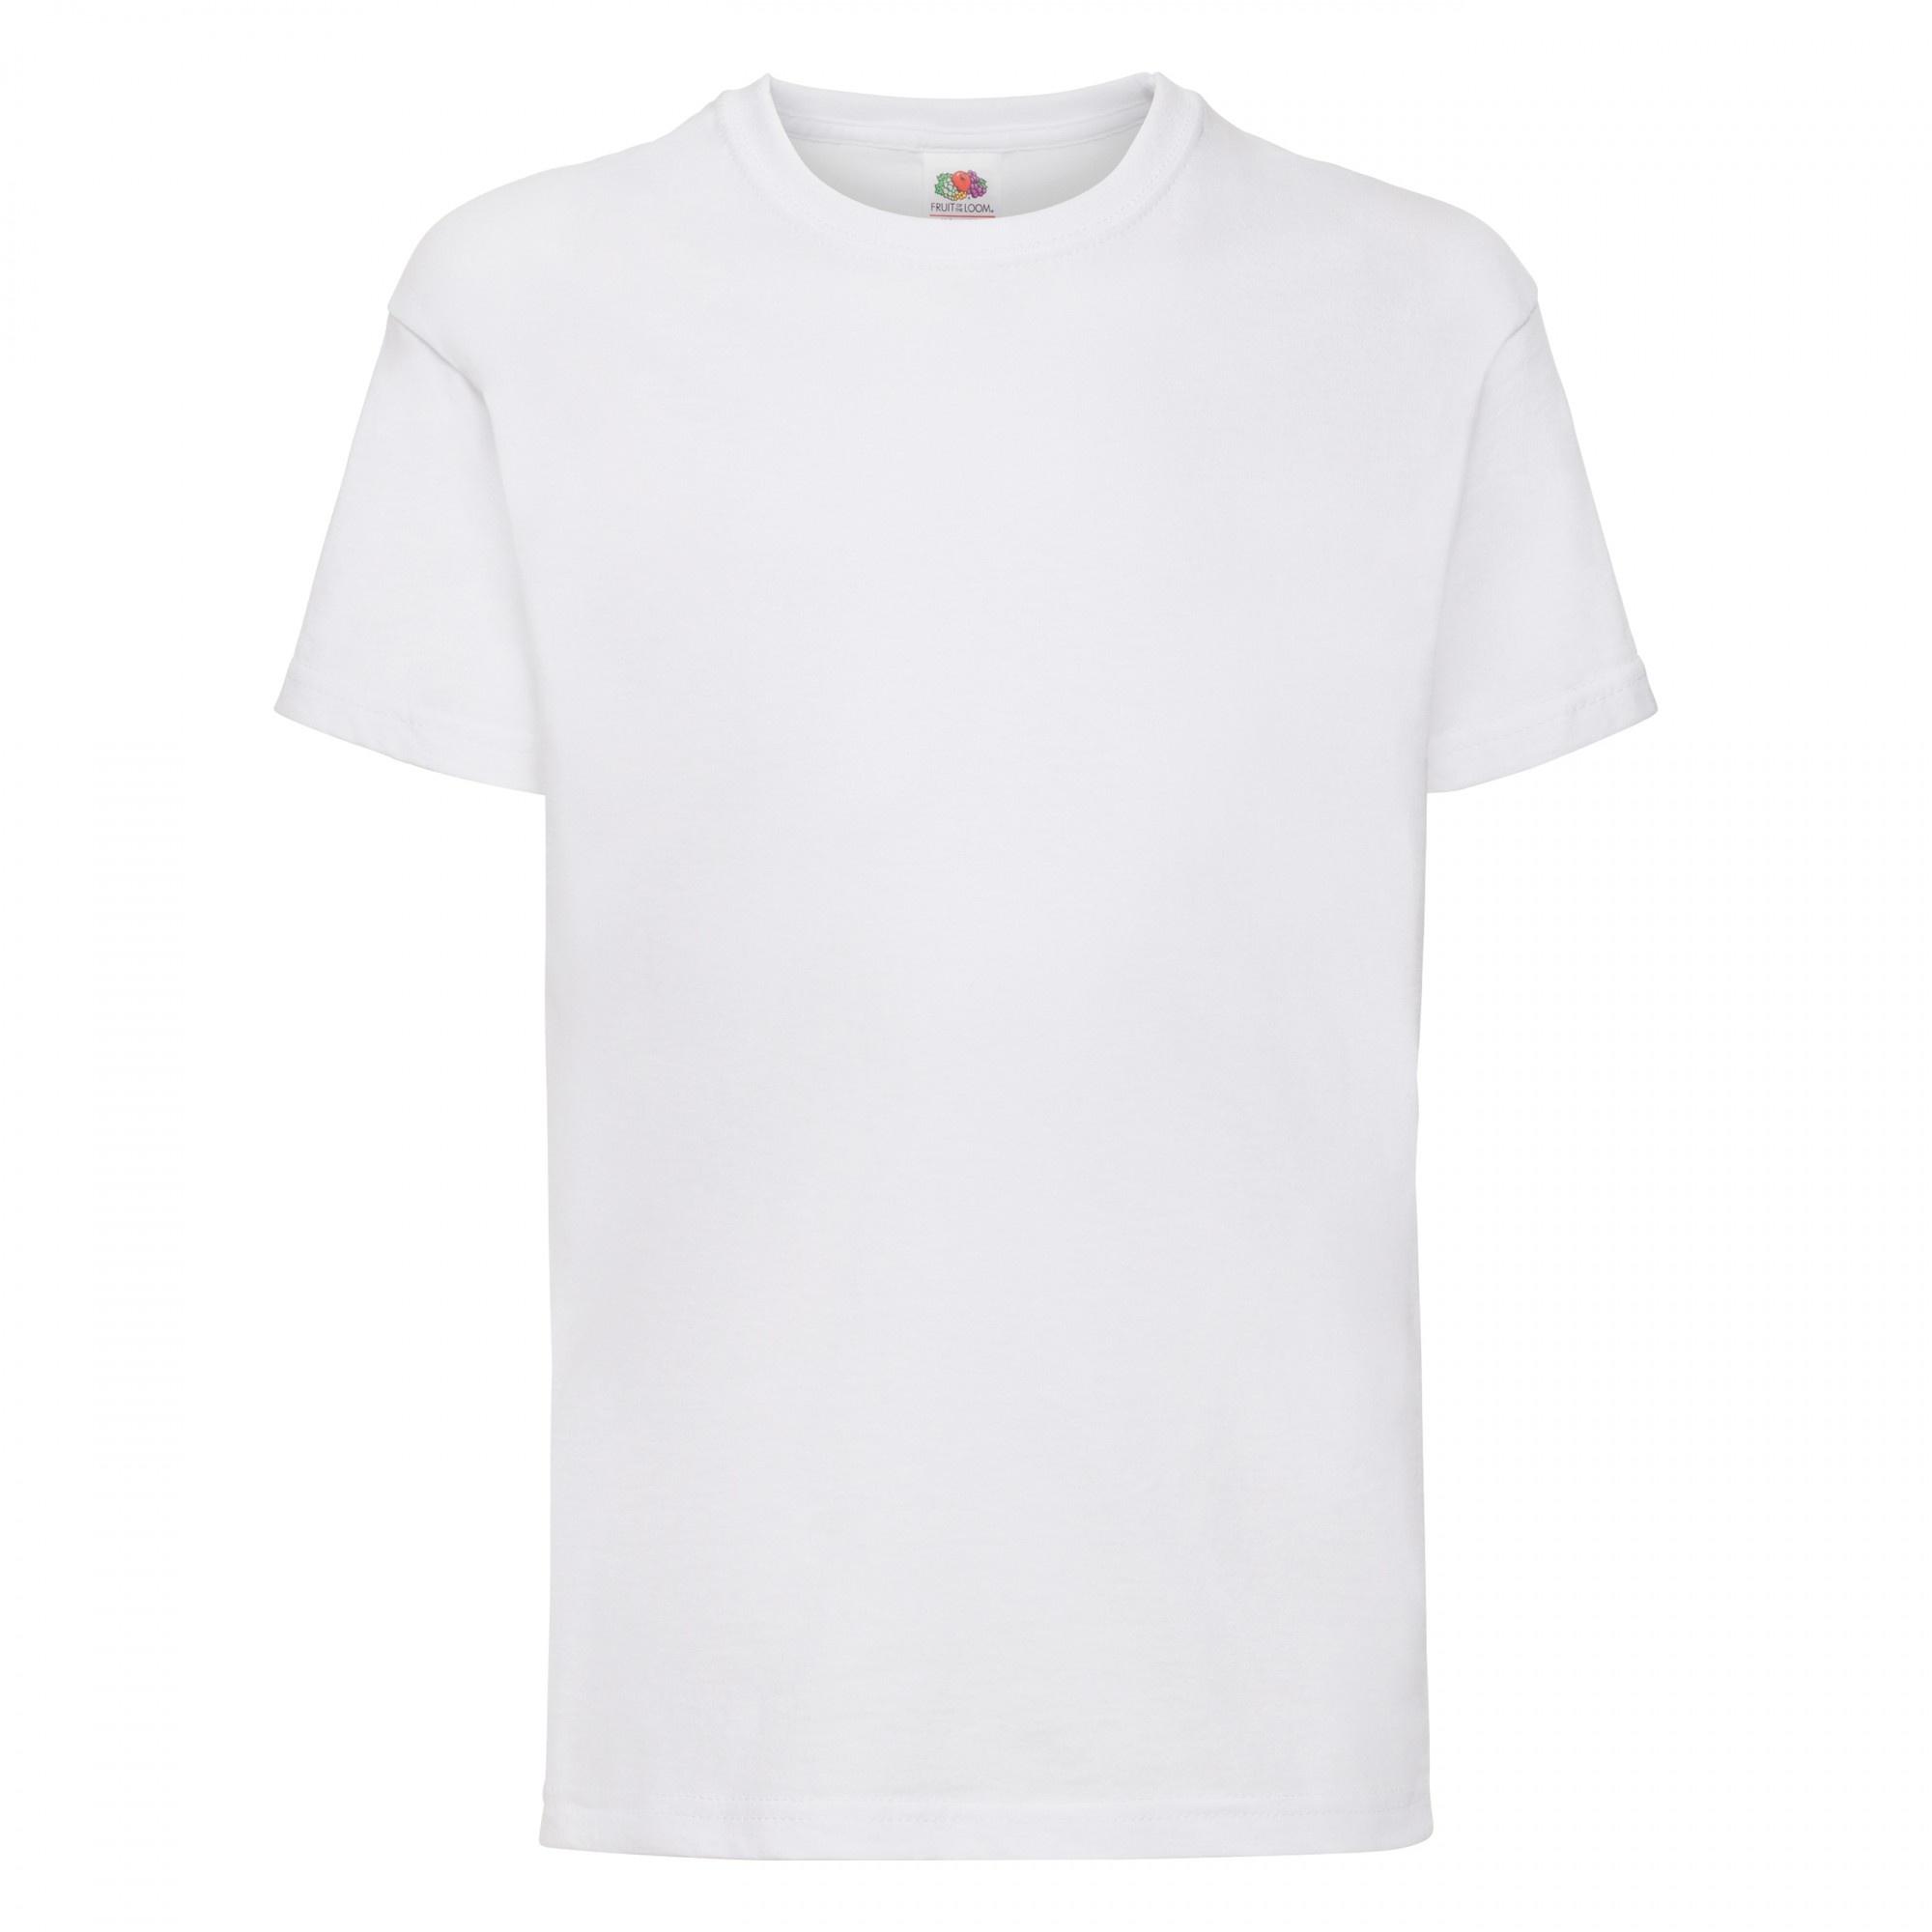 Fruit-Of-The-Loom-Camiseta-basica-de-manga-corta-unisex-100-BC329